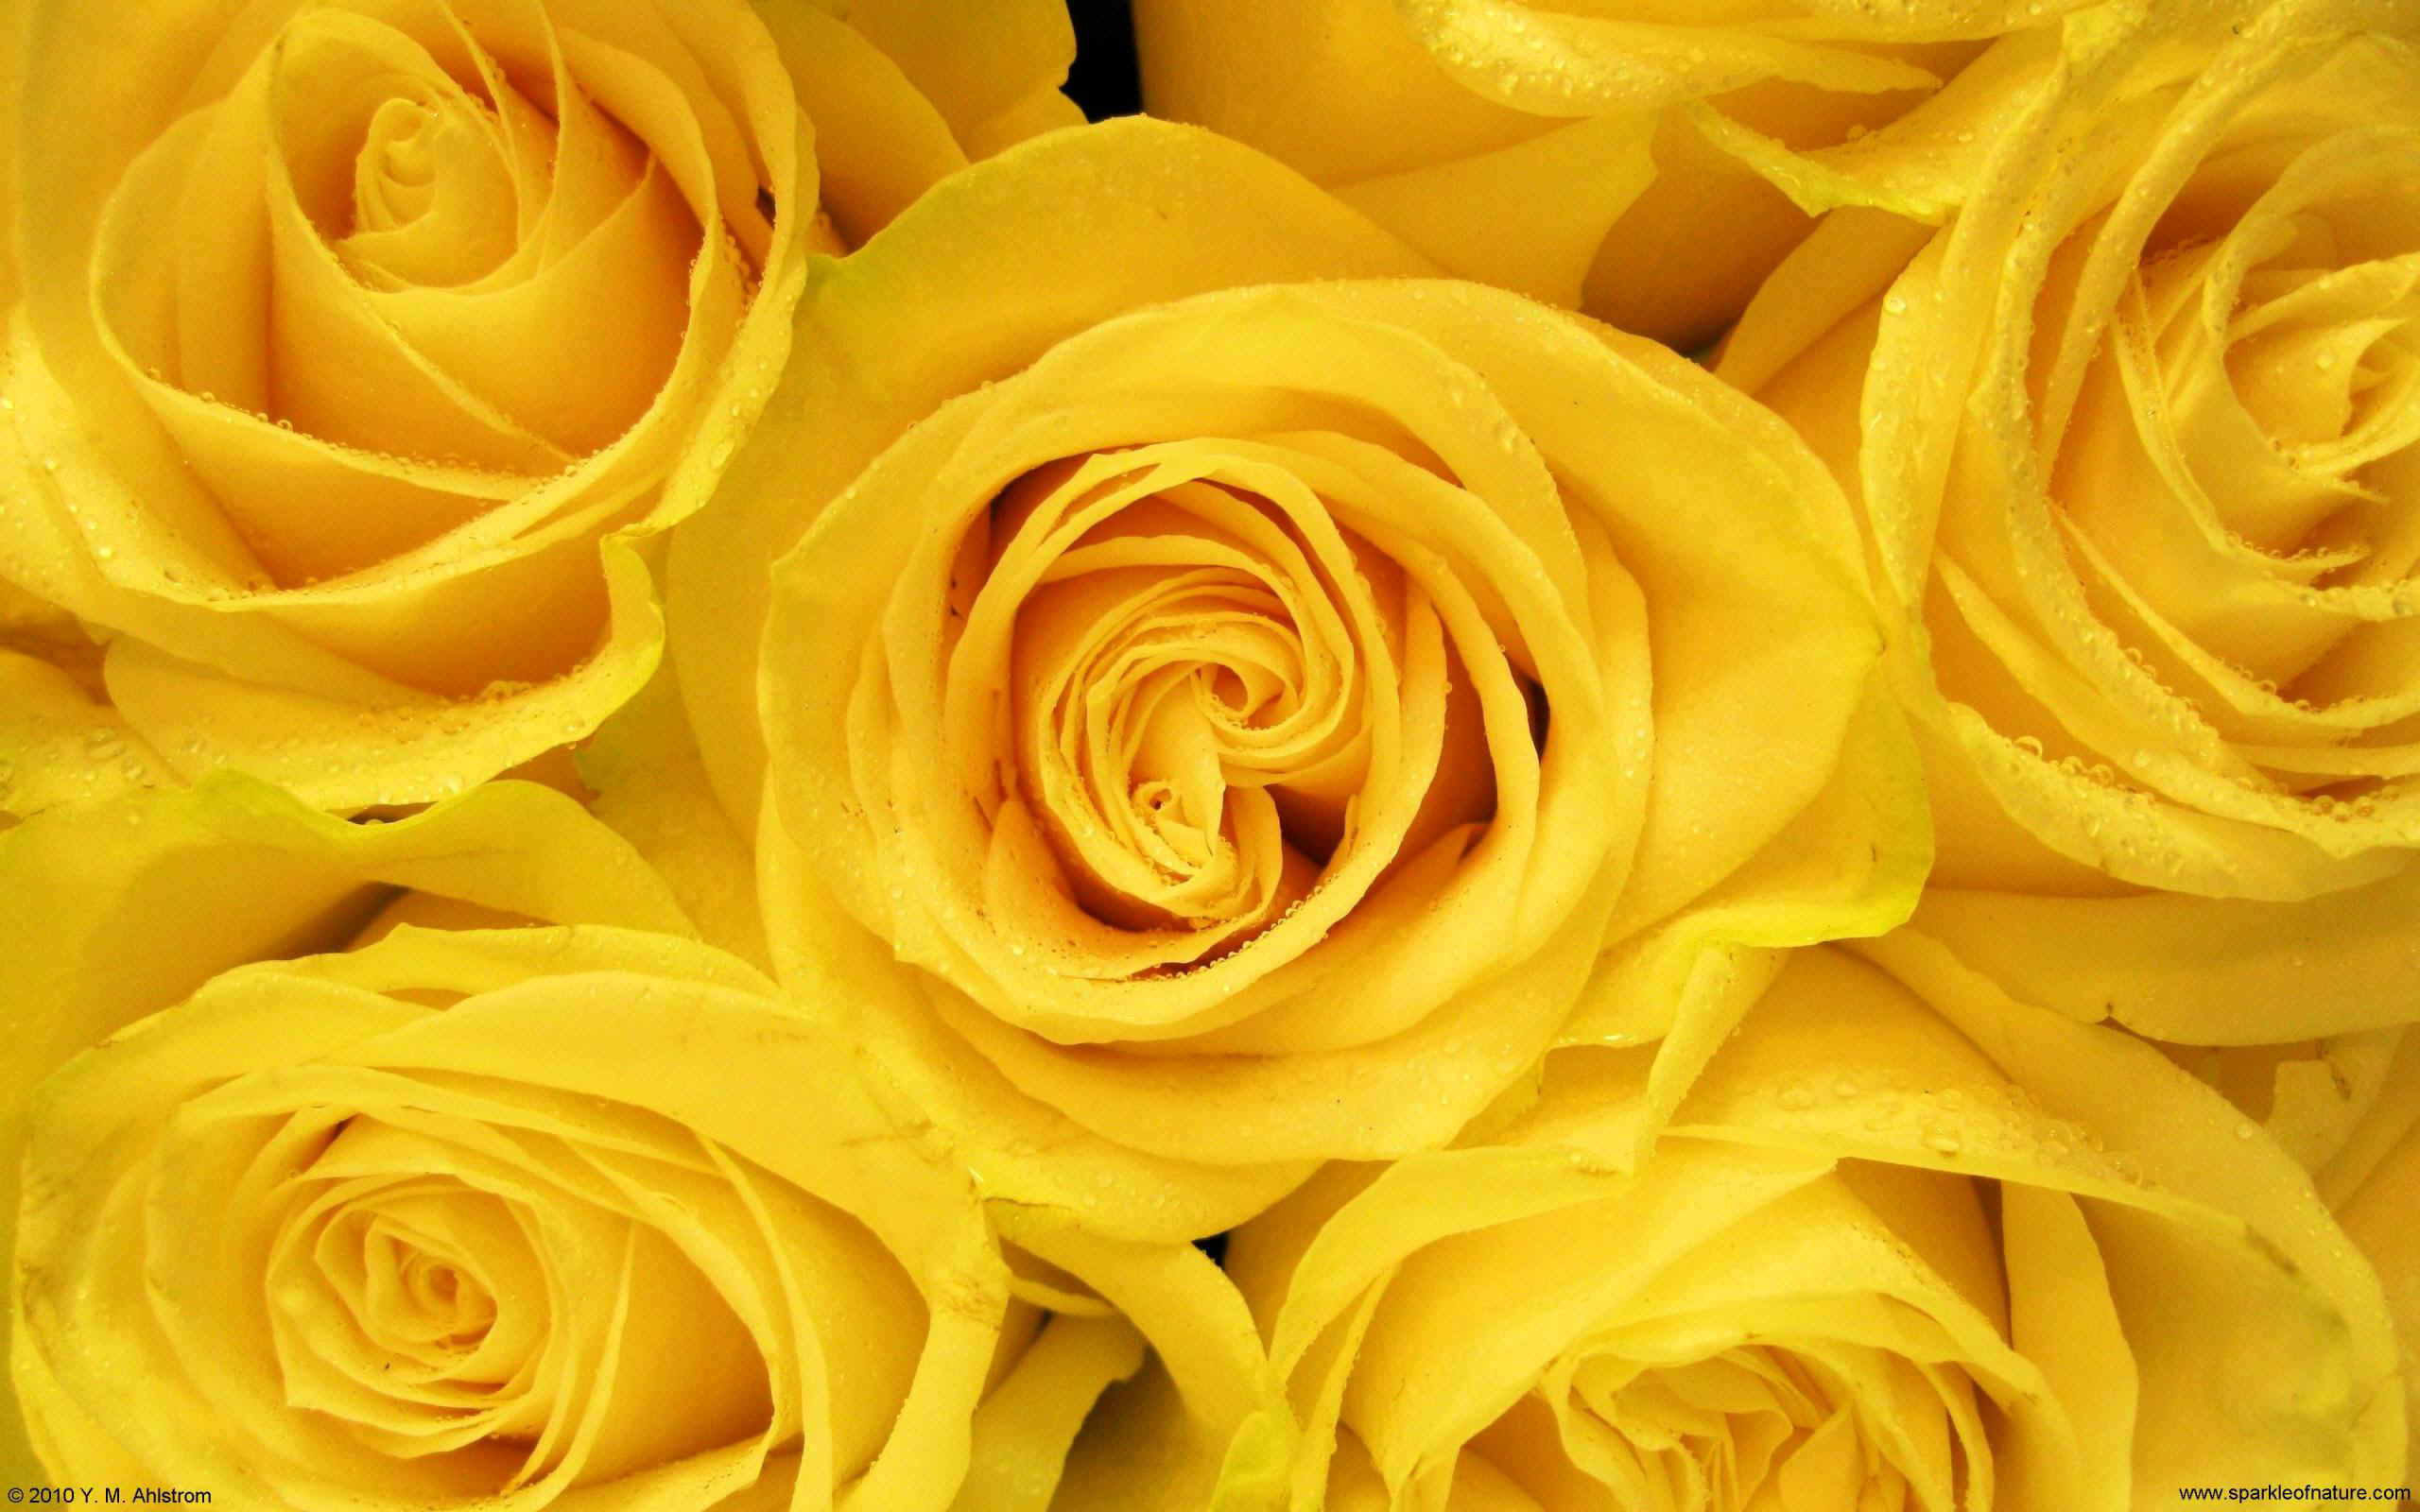 Desktop Yellow Aesthetic Rose Wallpapers Pictures Www Picturesboss Com